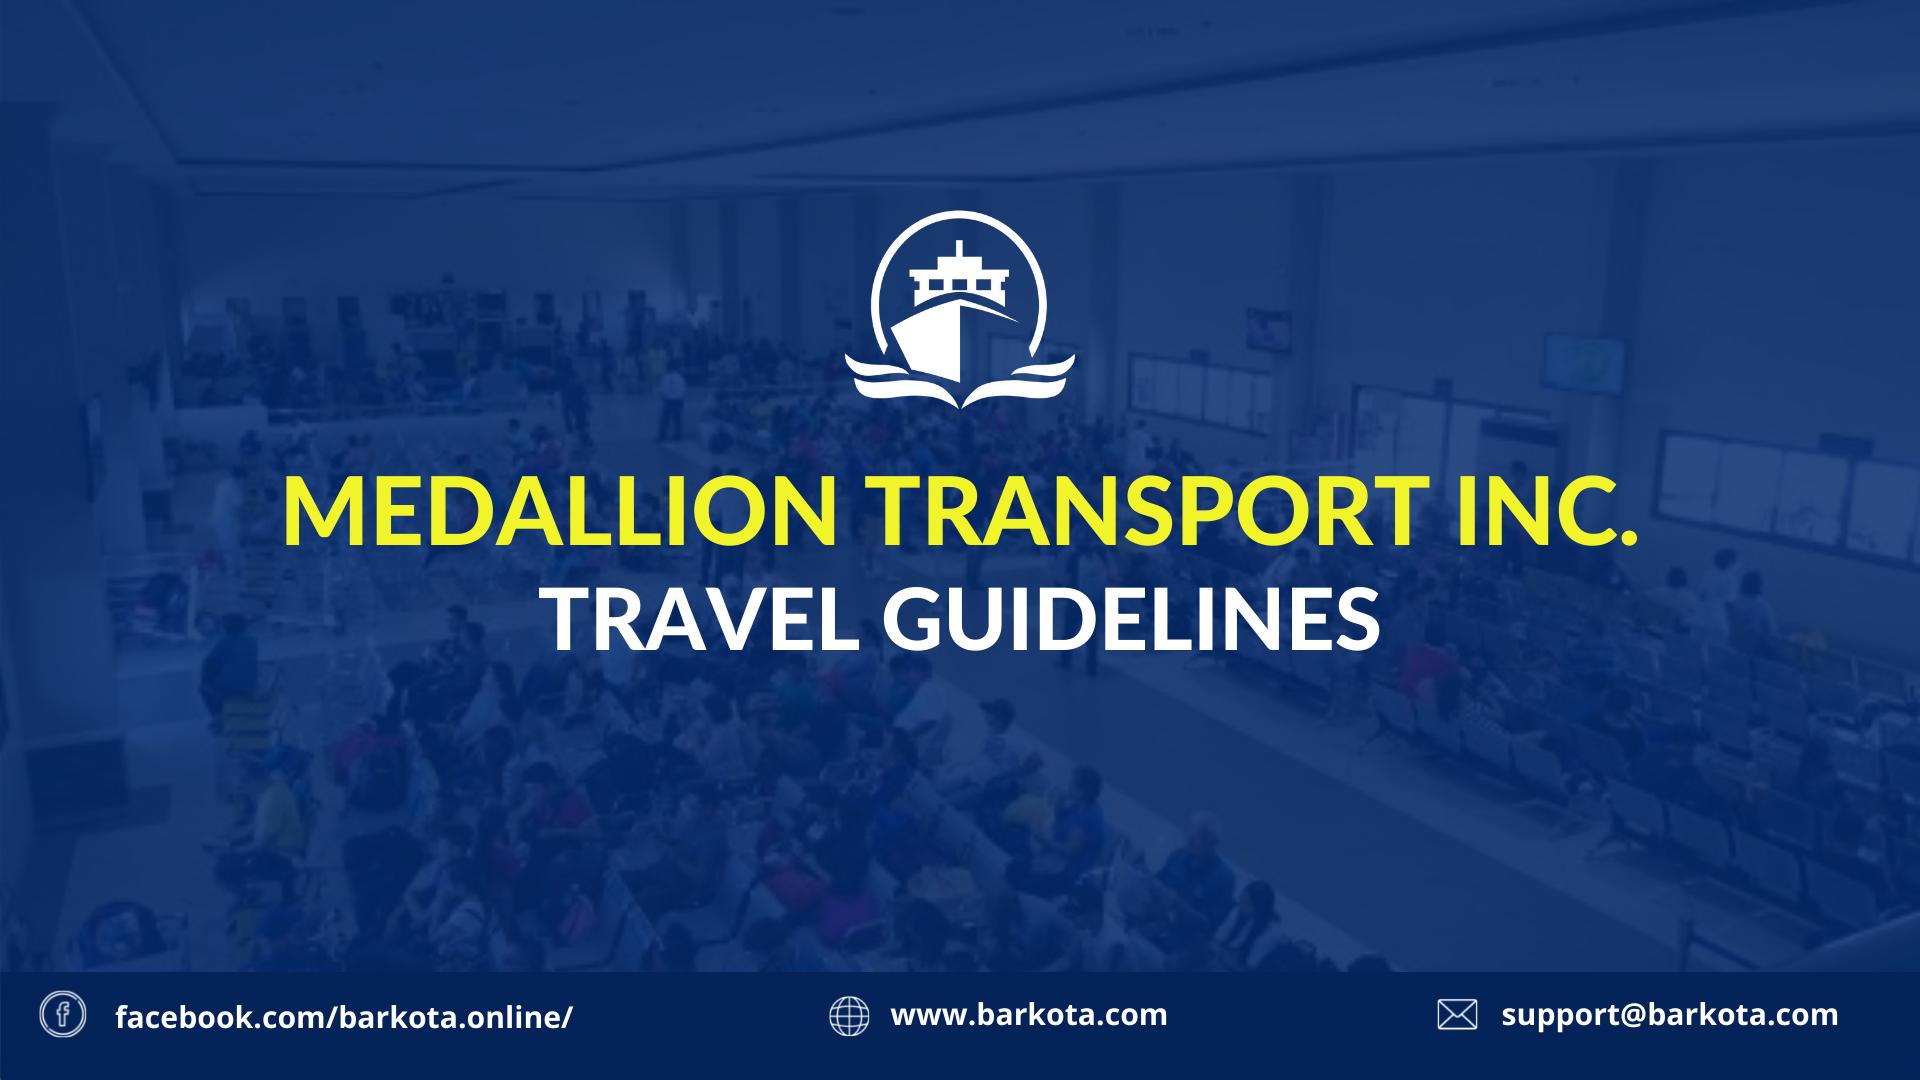 medallion transport travel guidelines